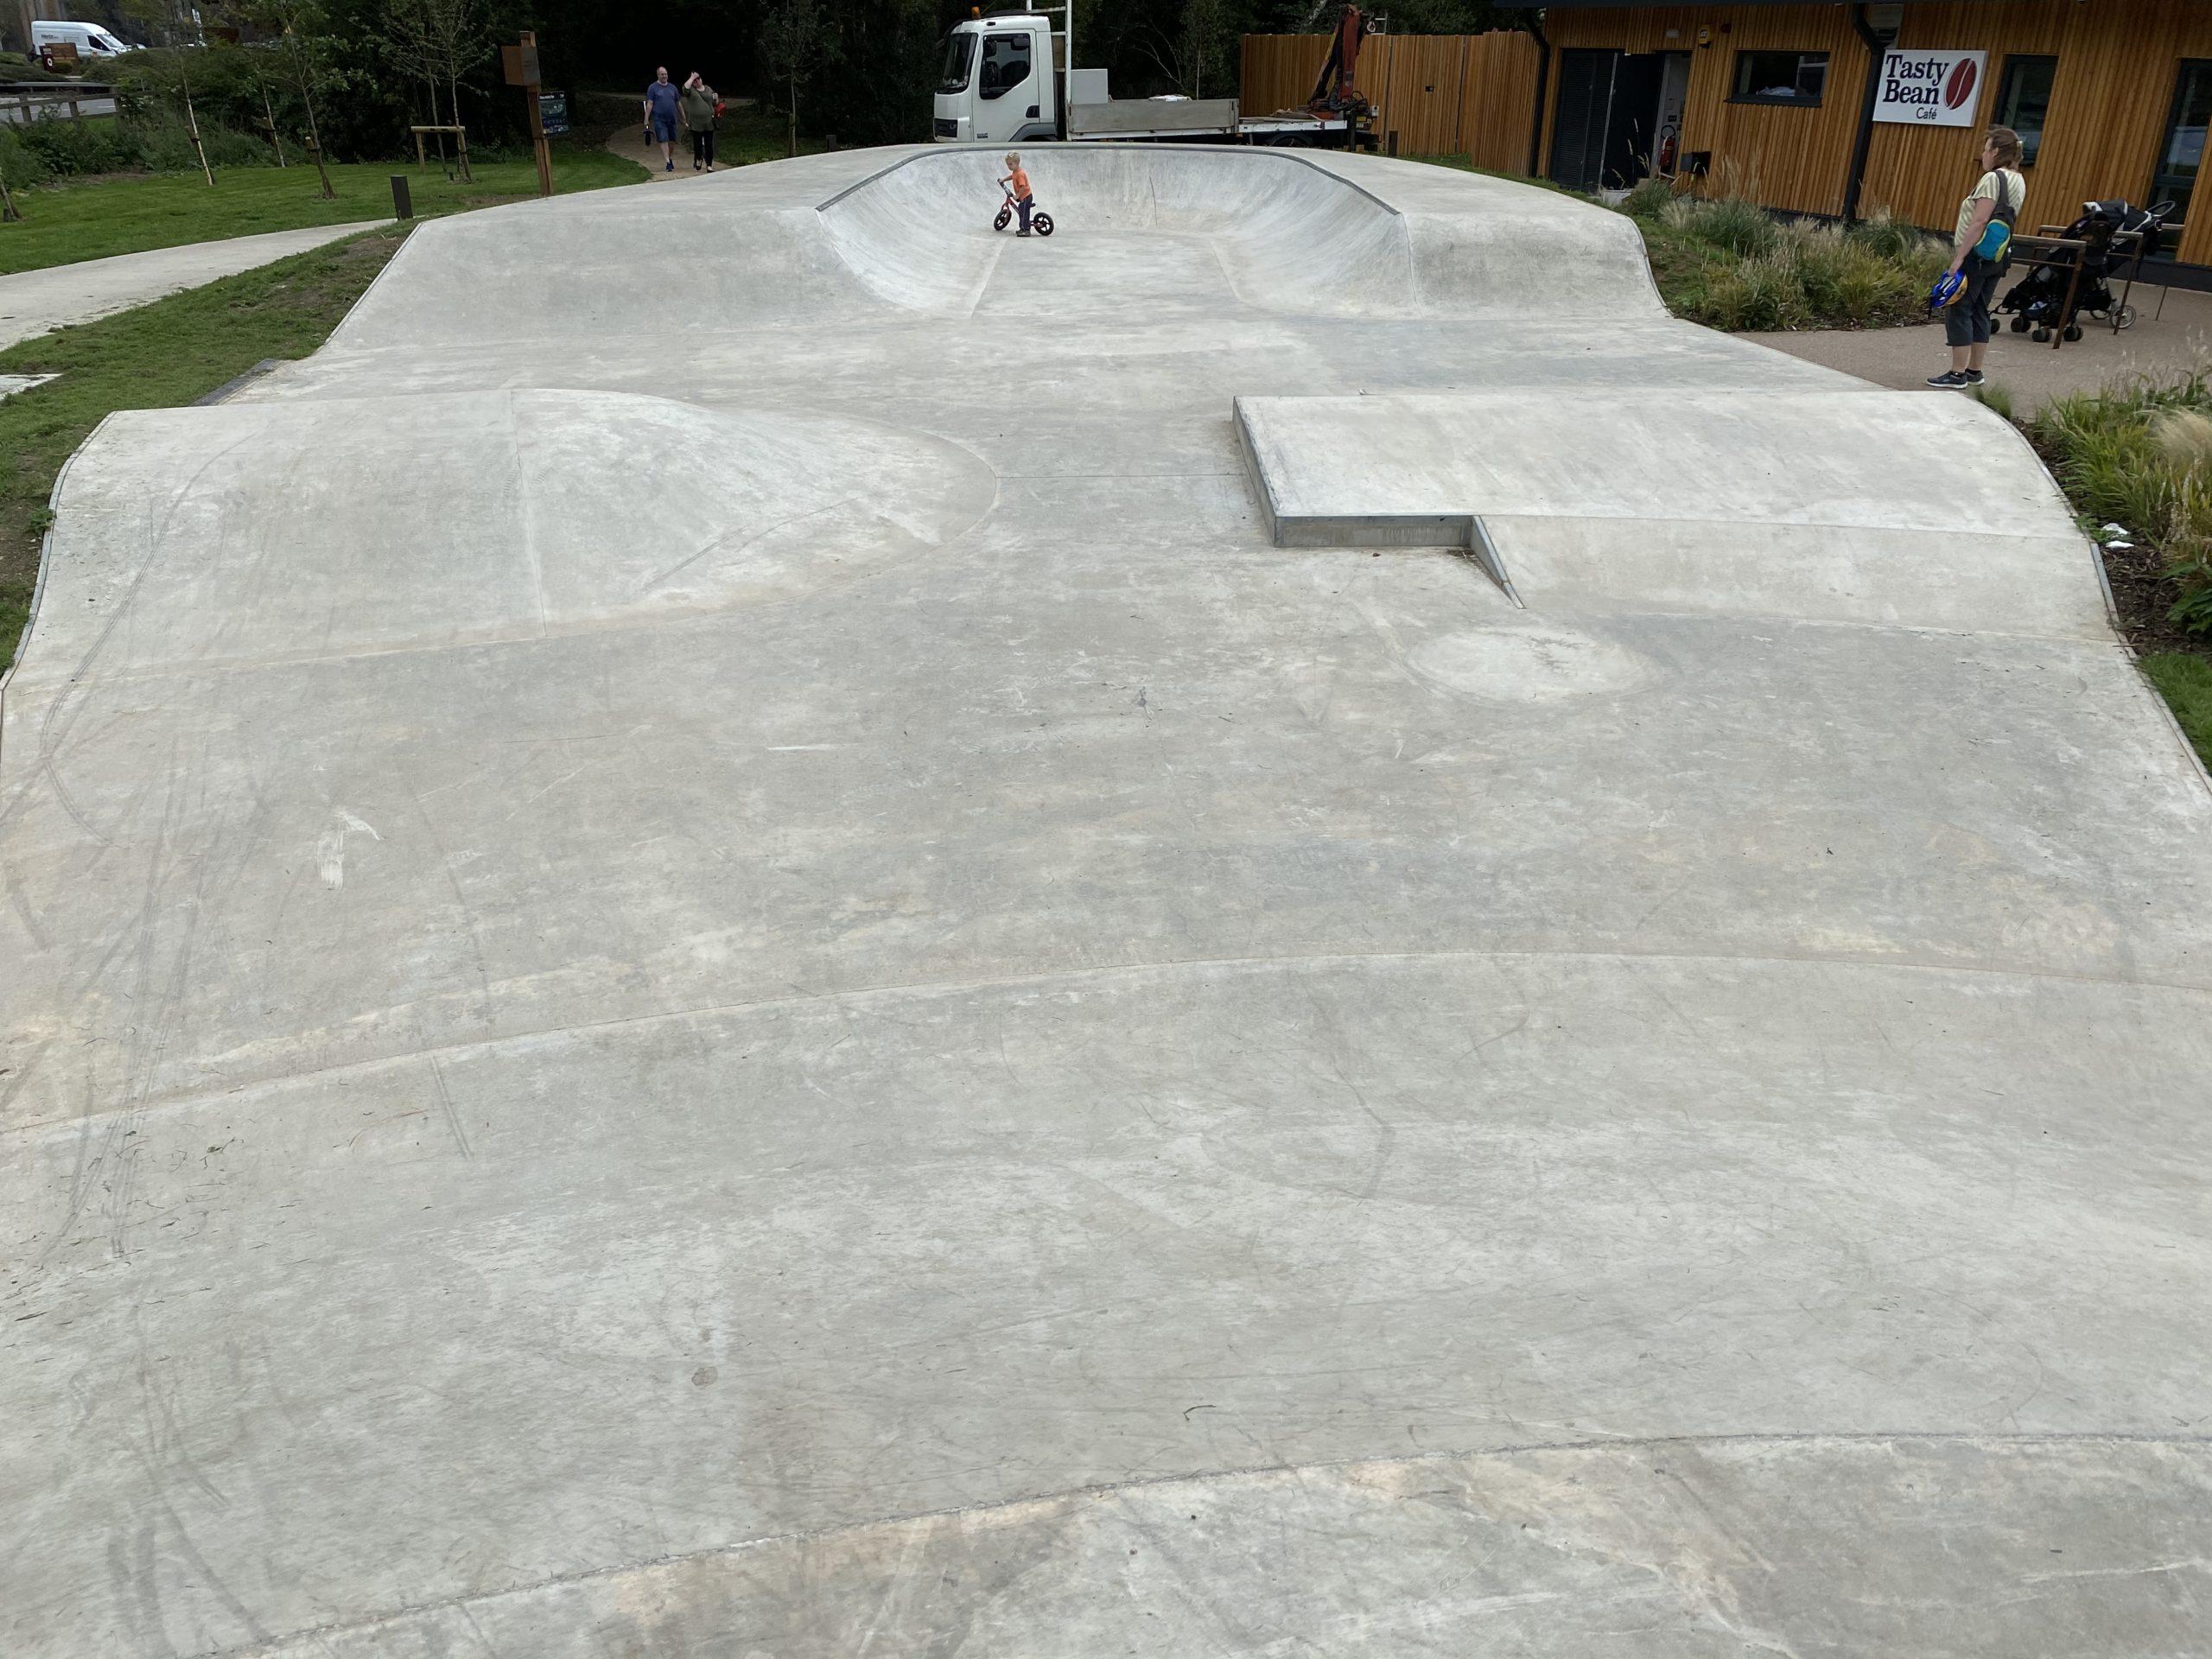 Trick Tech Scooter coaching watford oxhey skatepark